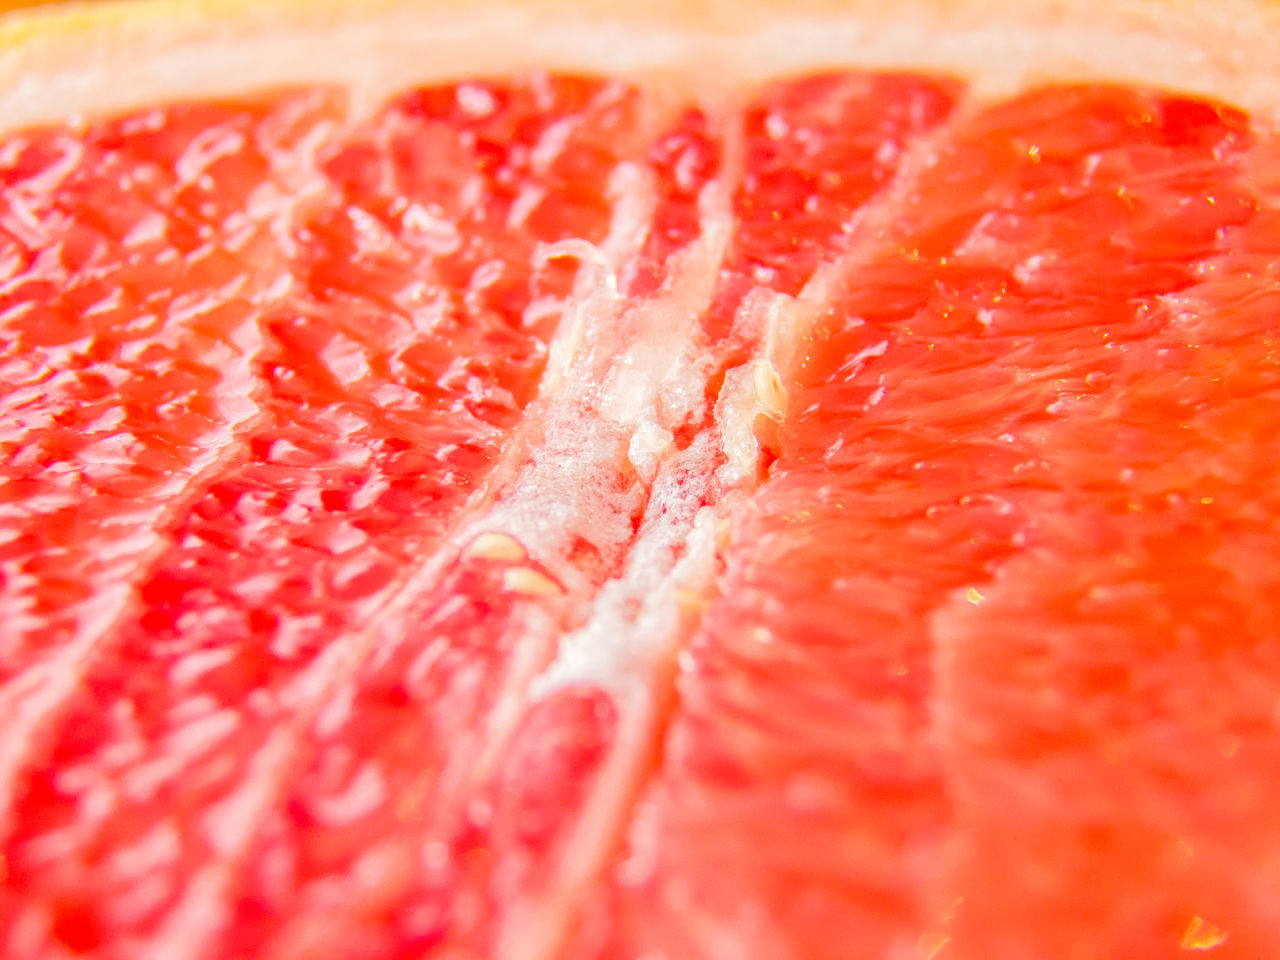 Grapefruit close-up texture. Blood Orange Citrus  Citrus Fruit Close-up Food Food And Drink Freshness Fruit Grapefruit Healthy Eating Healthy Lifestyle Indoors  Juicy Juicy Fruit Macro Orange Pattern Pink Red SLICE Sliced Texture